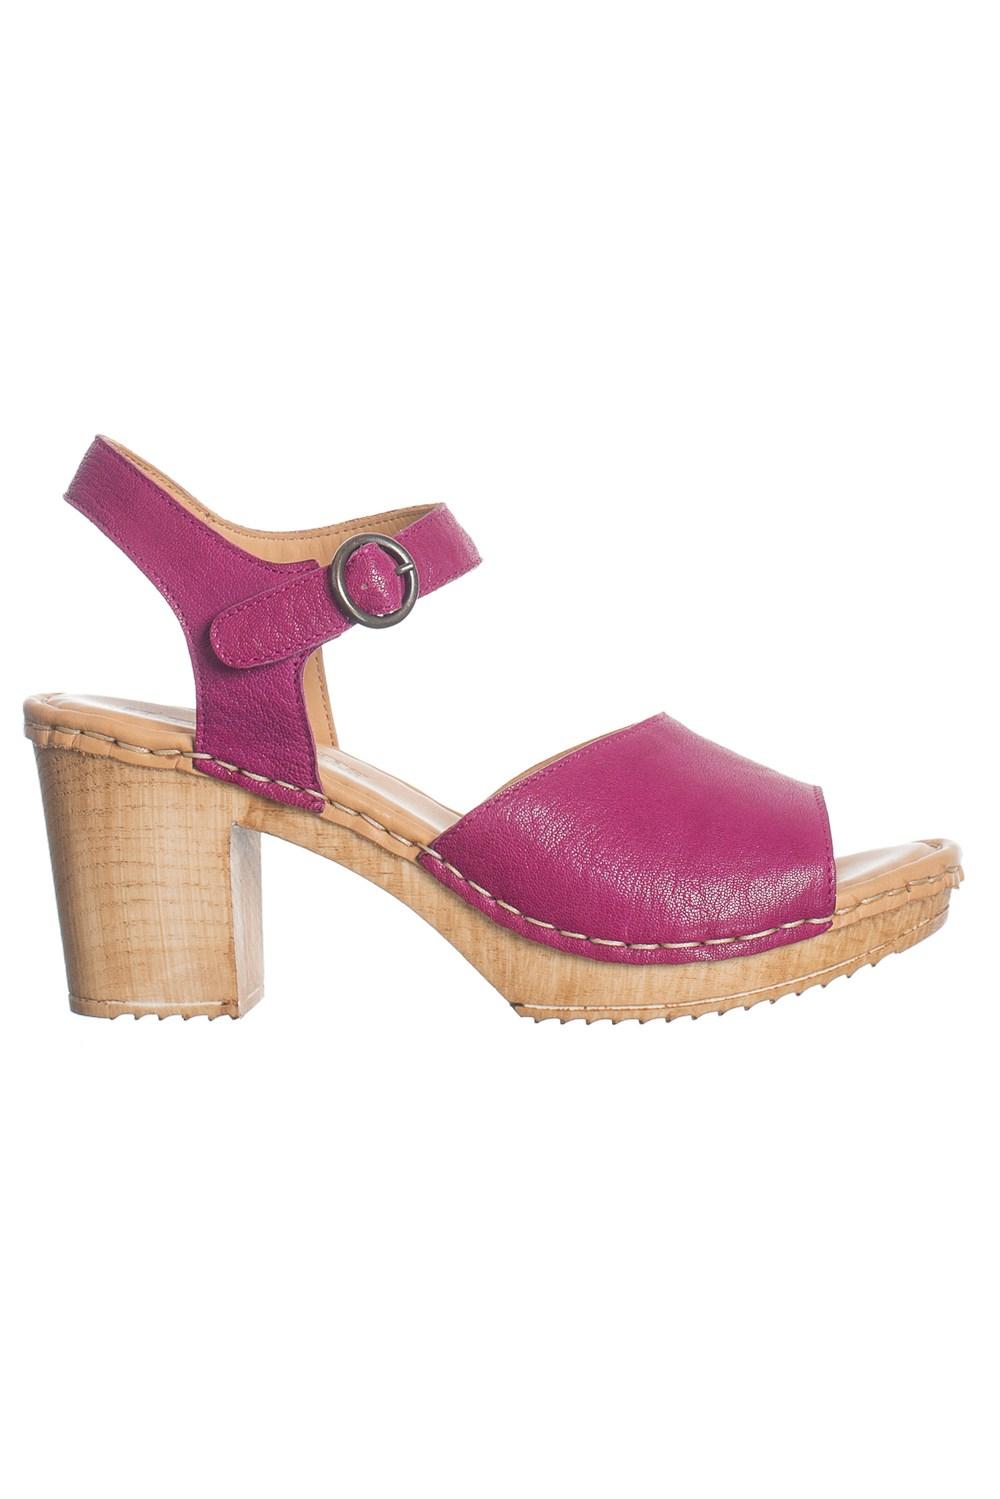 Amelia sko öppen tå magenta